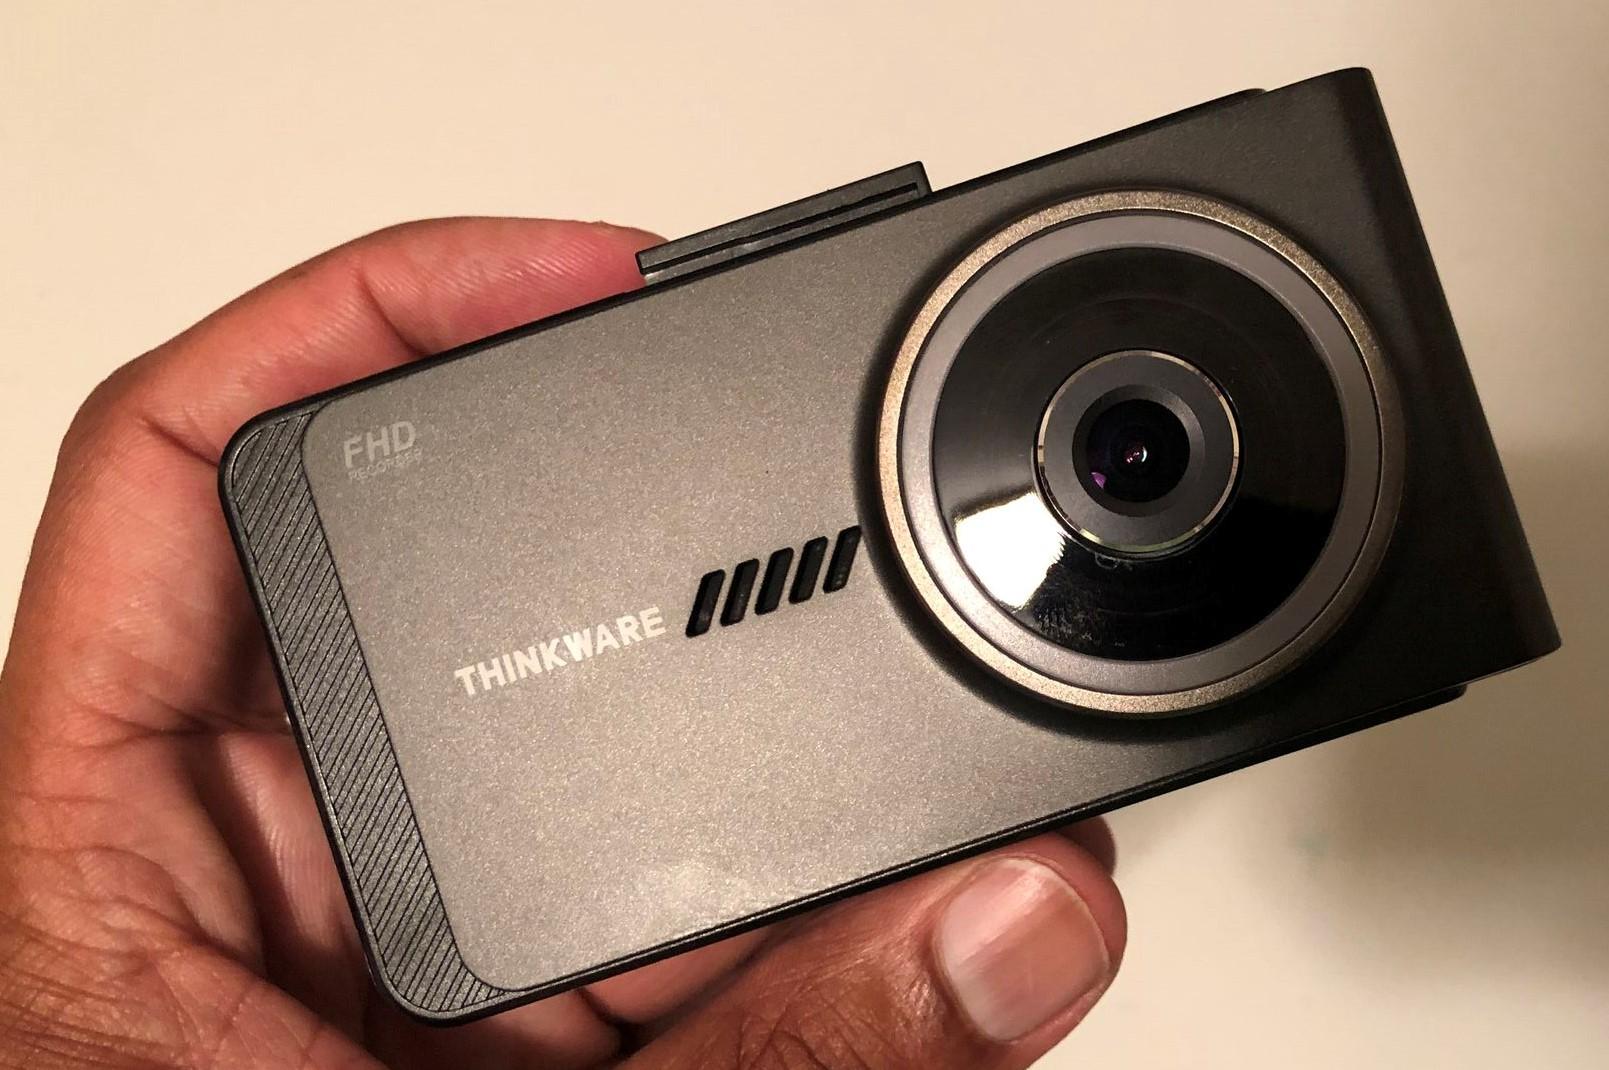 X700 de Thinkware